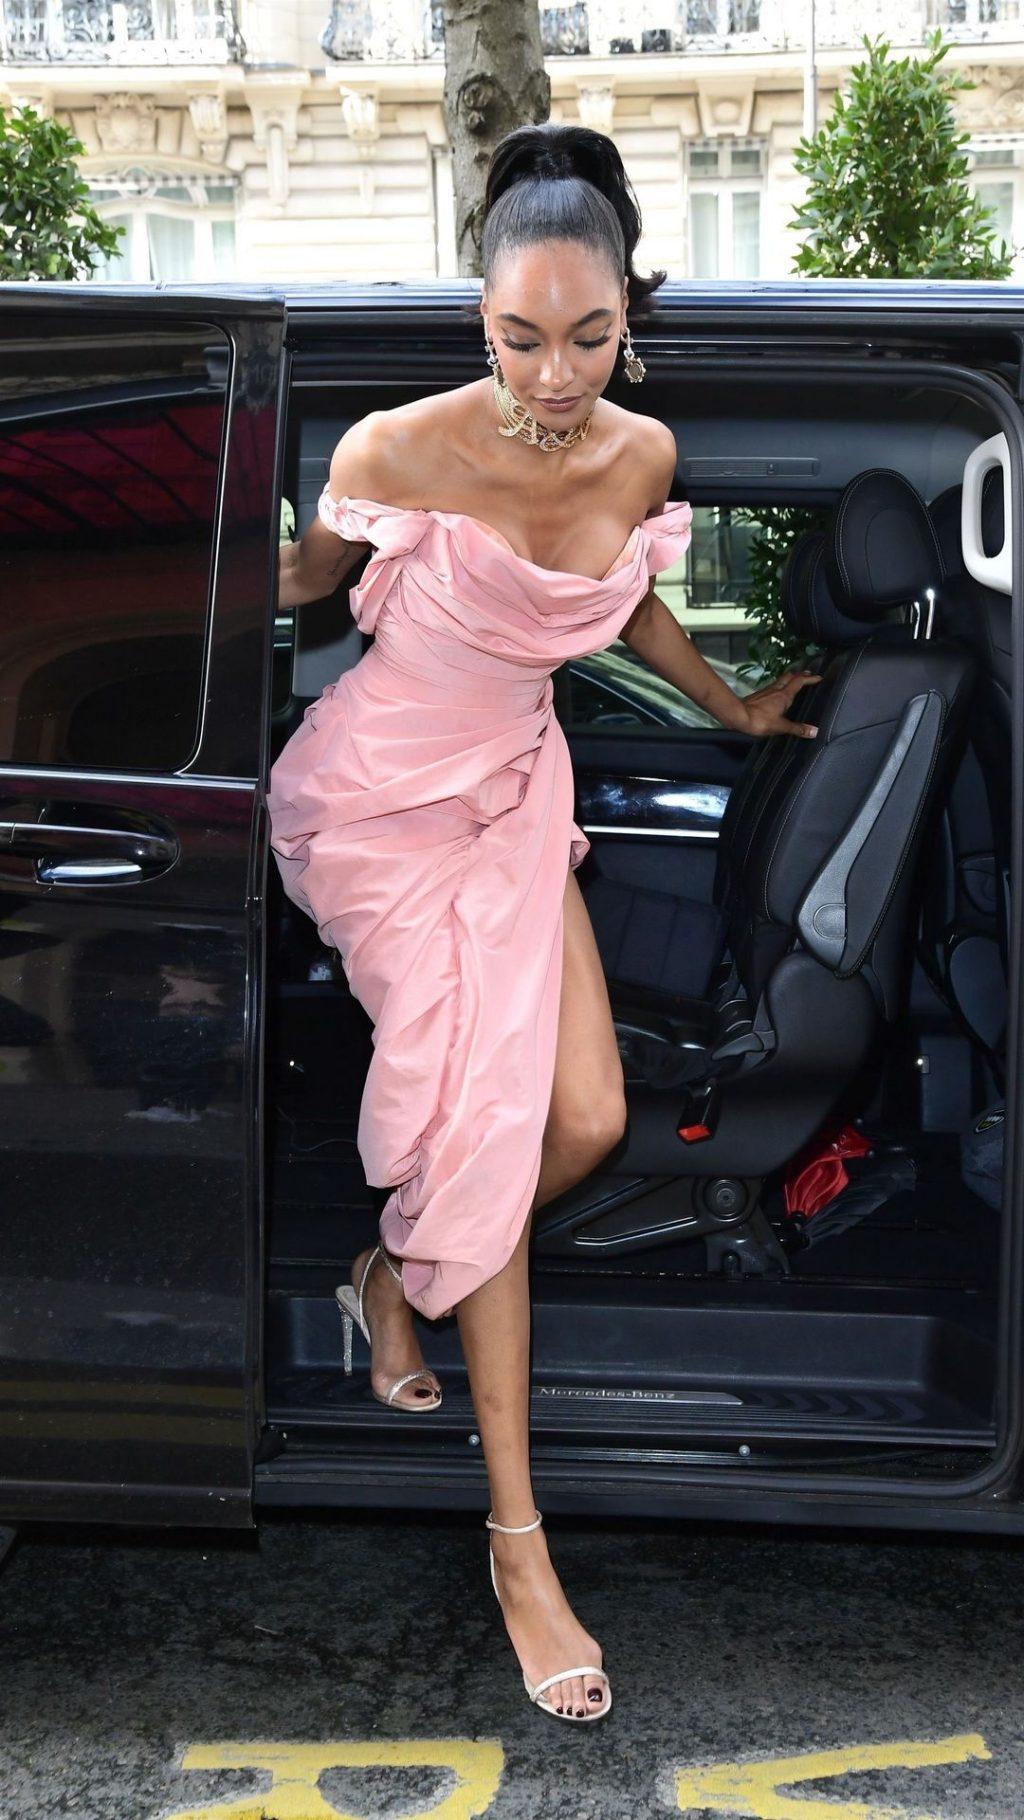 Jourdan Dunn Shows Her Cleavage at the Royal Monceau Hotel During Paris Fashion Week (7 Photos)